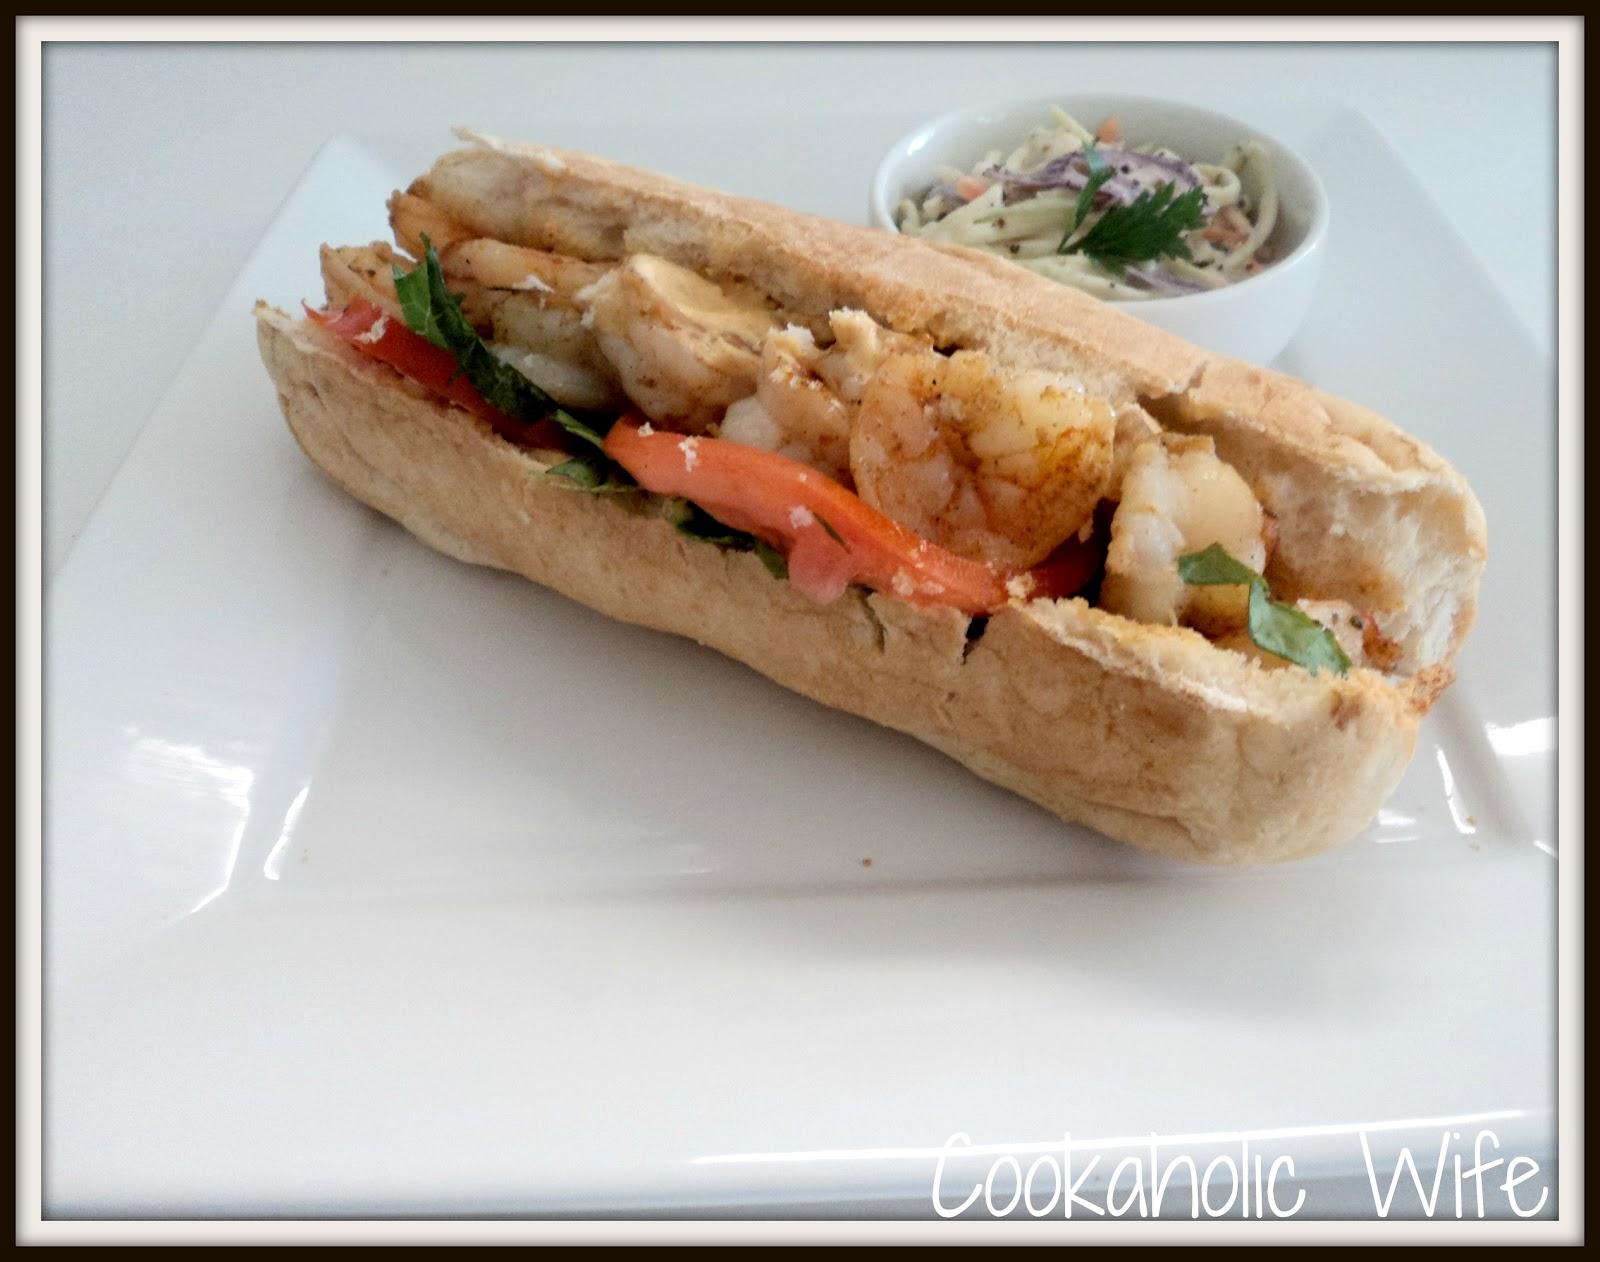 Cookaholic Wife: Recipe Swap: Shrimp Po Boy Sandwiches